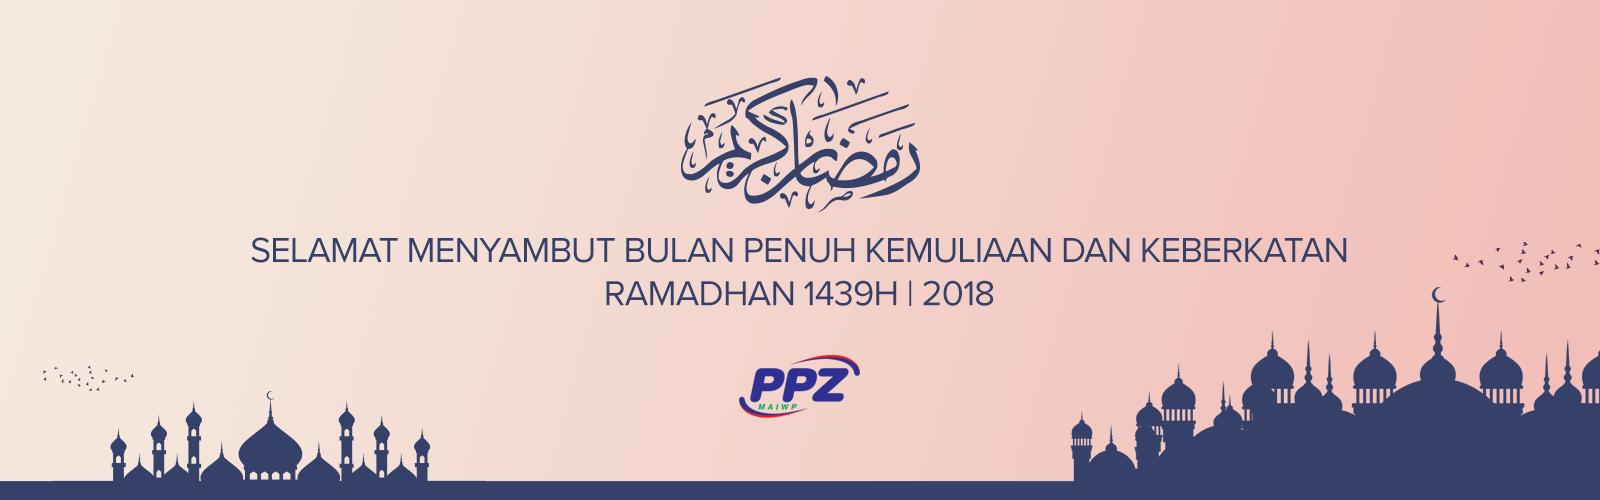 Selamat Menyambut Ramadhan 1439H